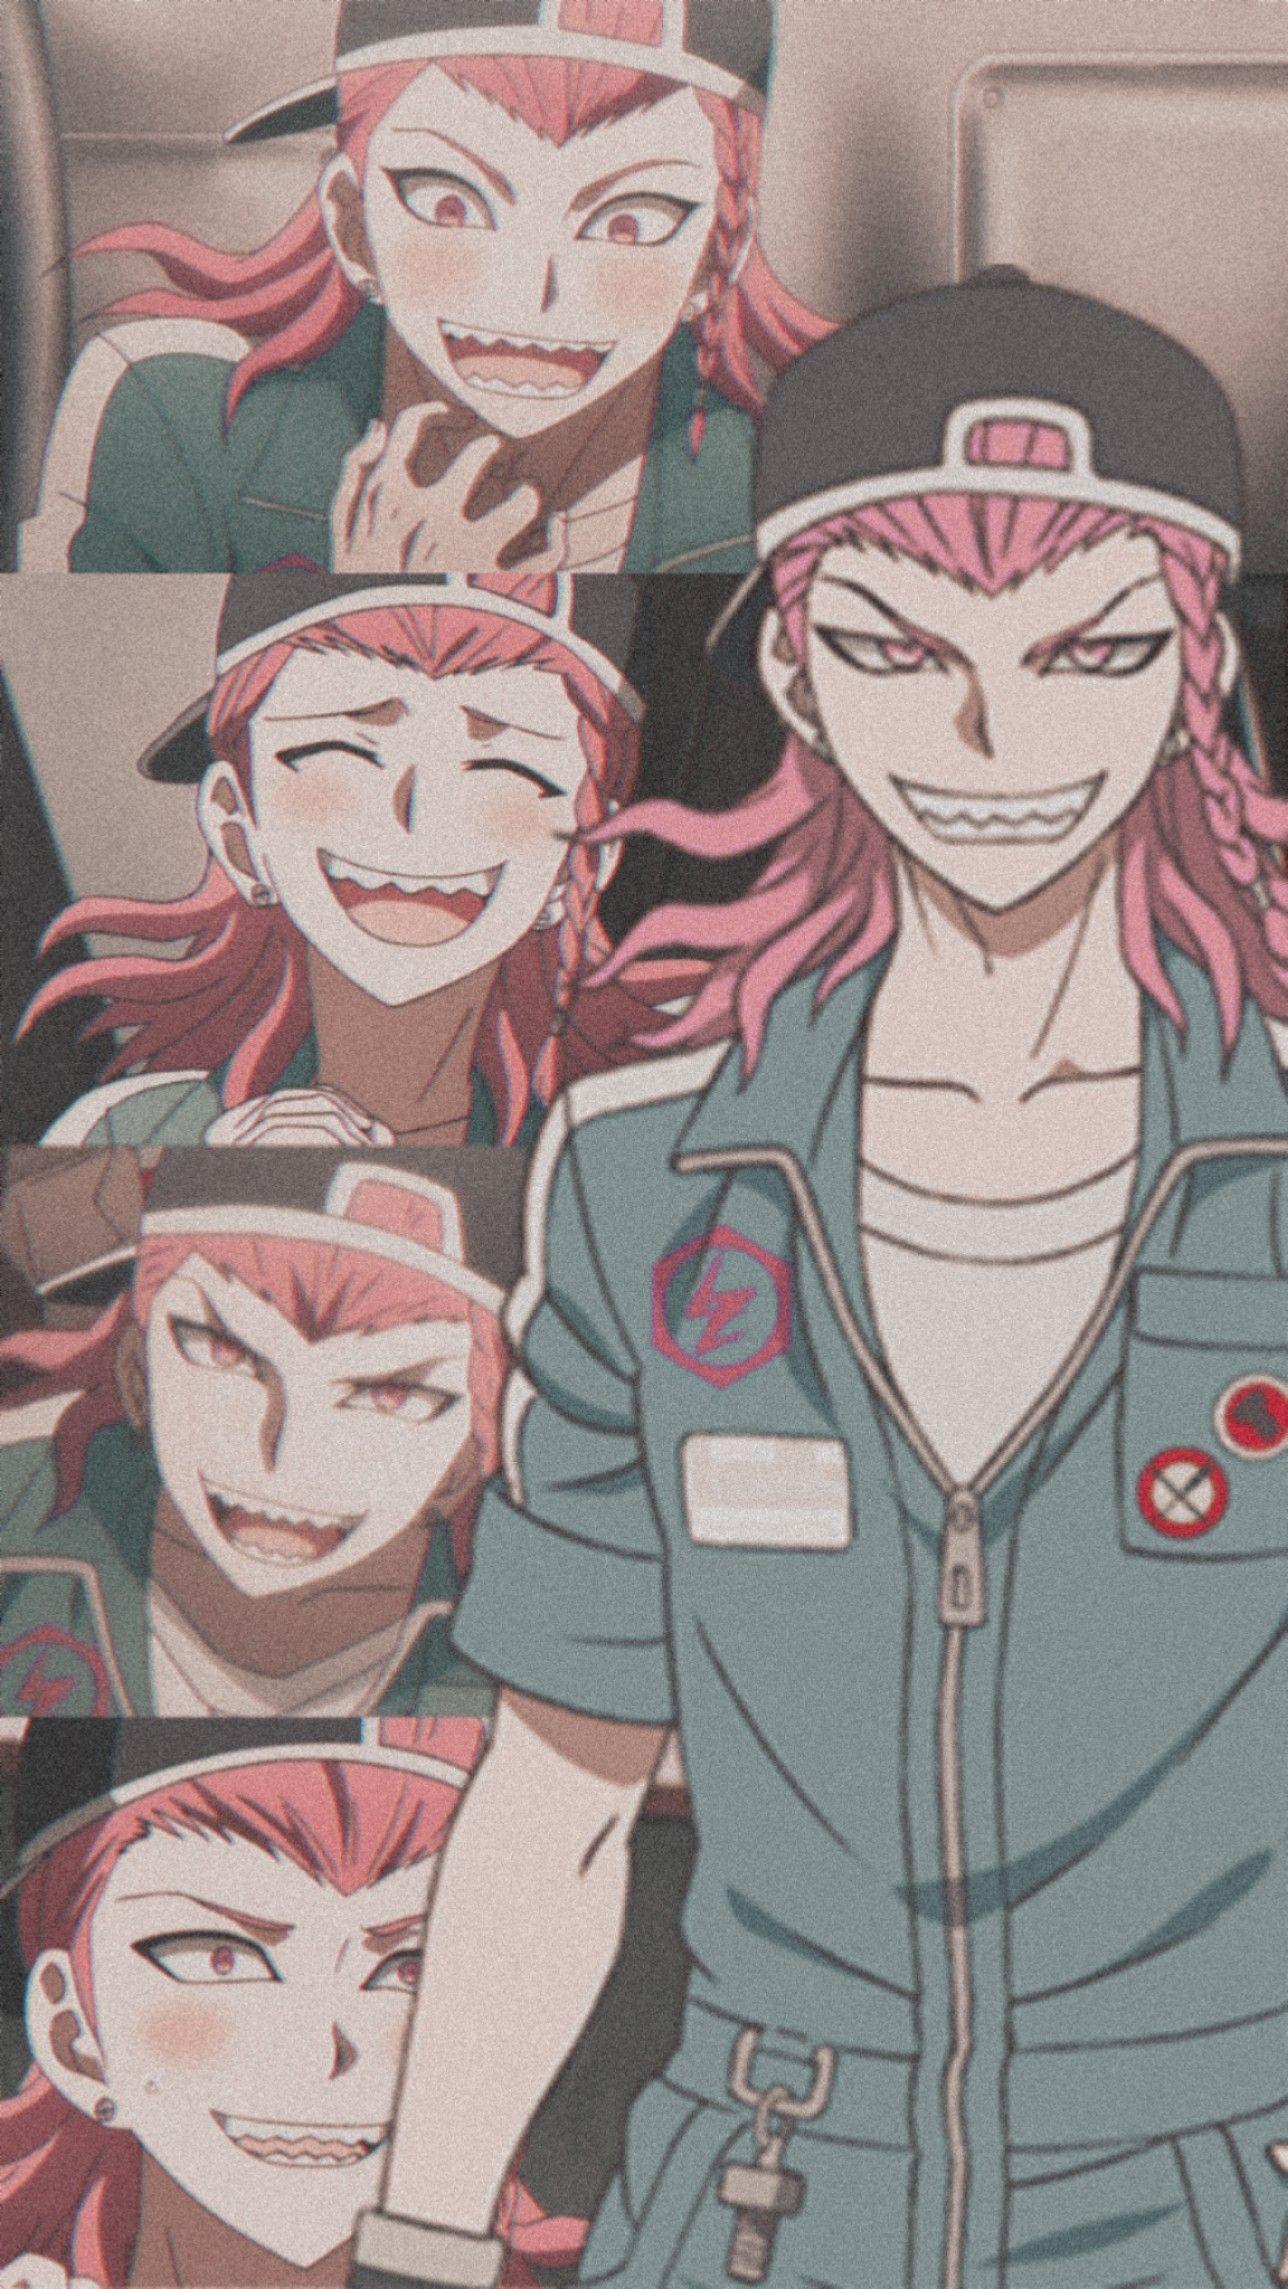 Kazuichi Soda Danganronpa Danganronpa Characters Anime